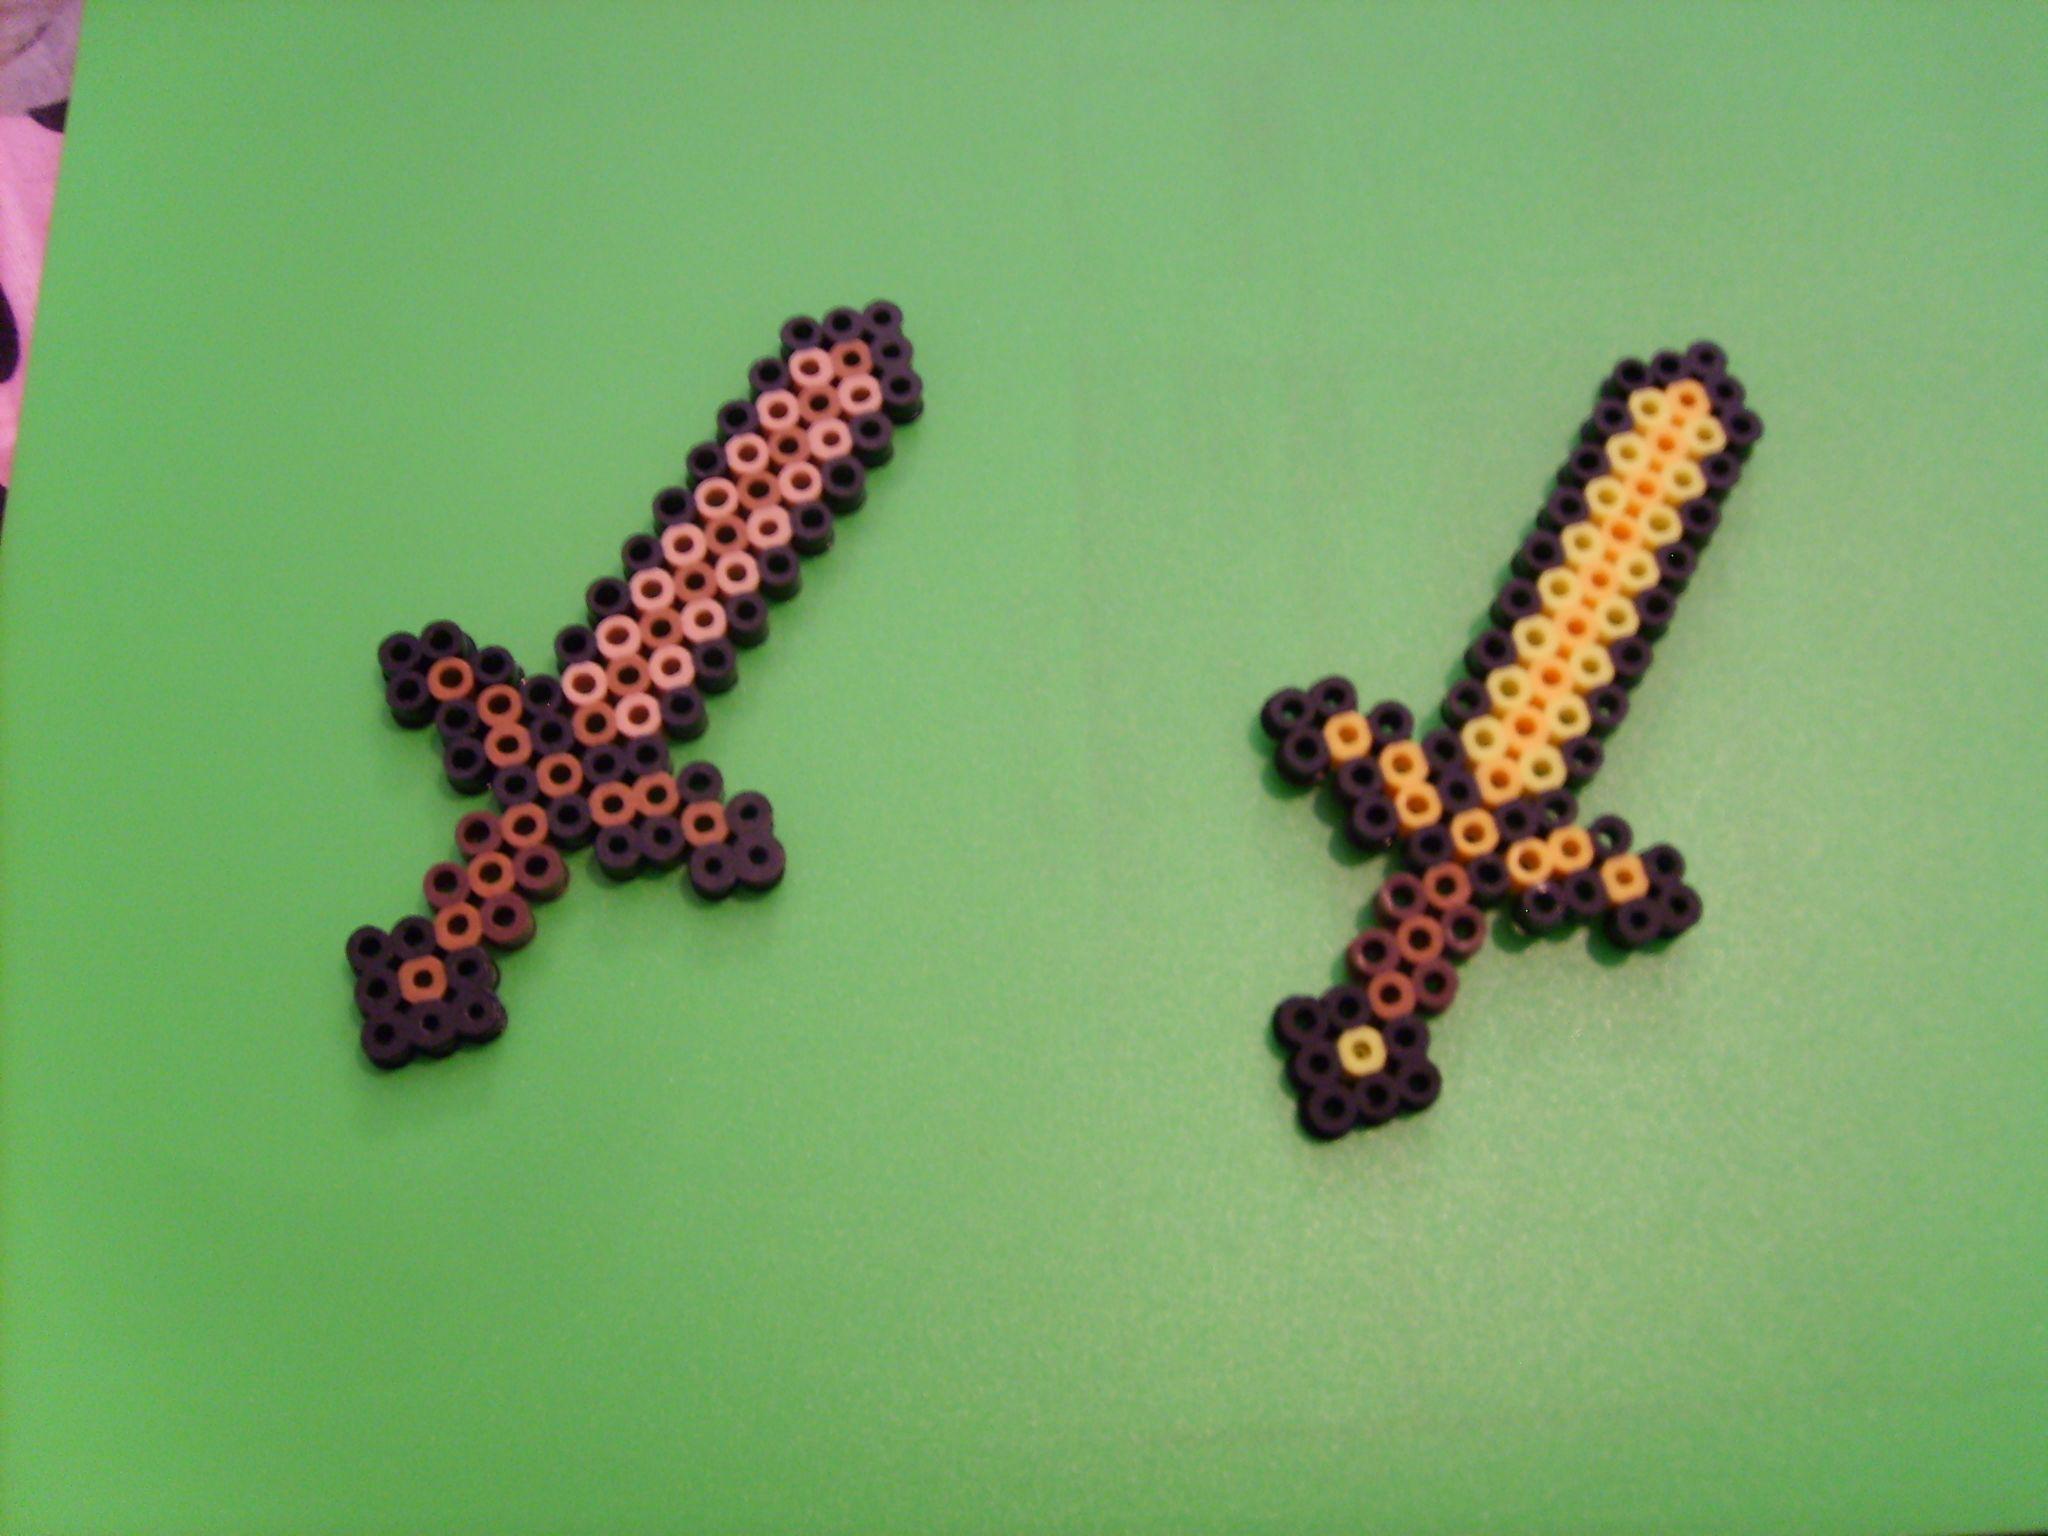 Minecraft Chicken Leg Ghast Heart Sword Torch Perler Beads